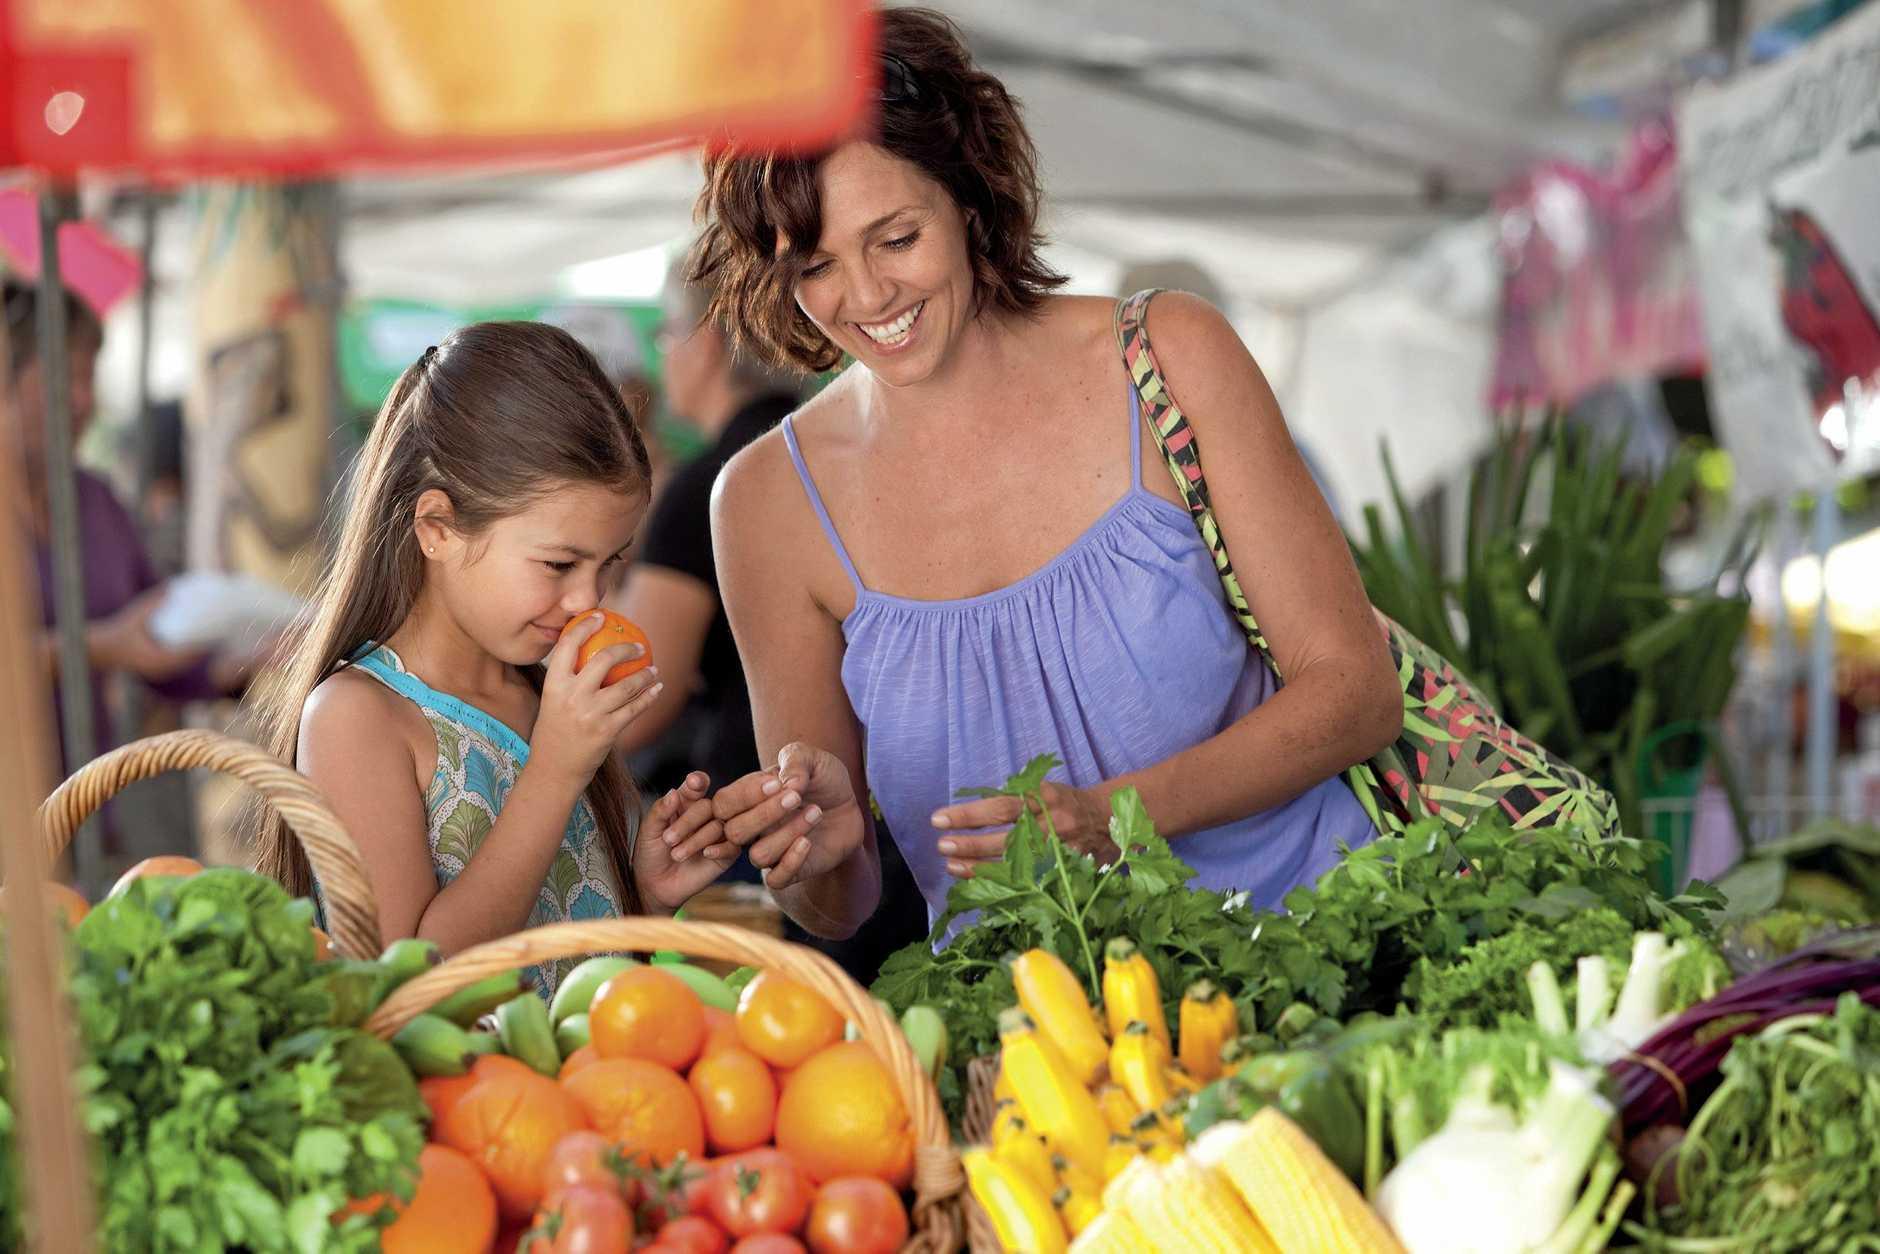 Generic markets photo